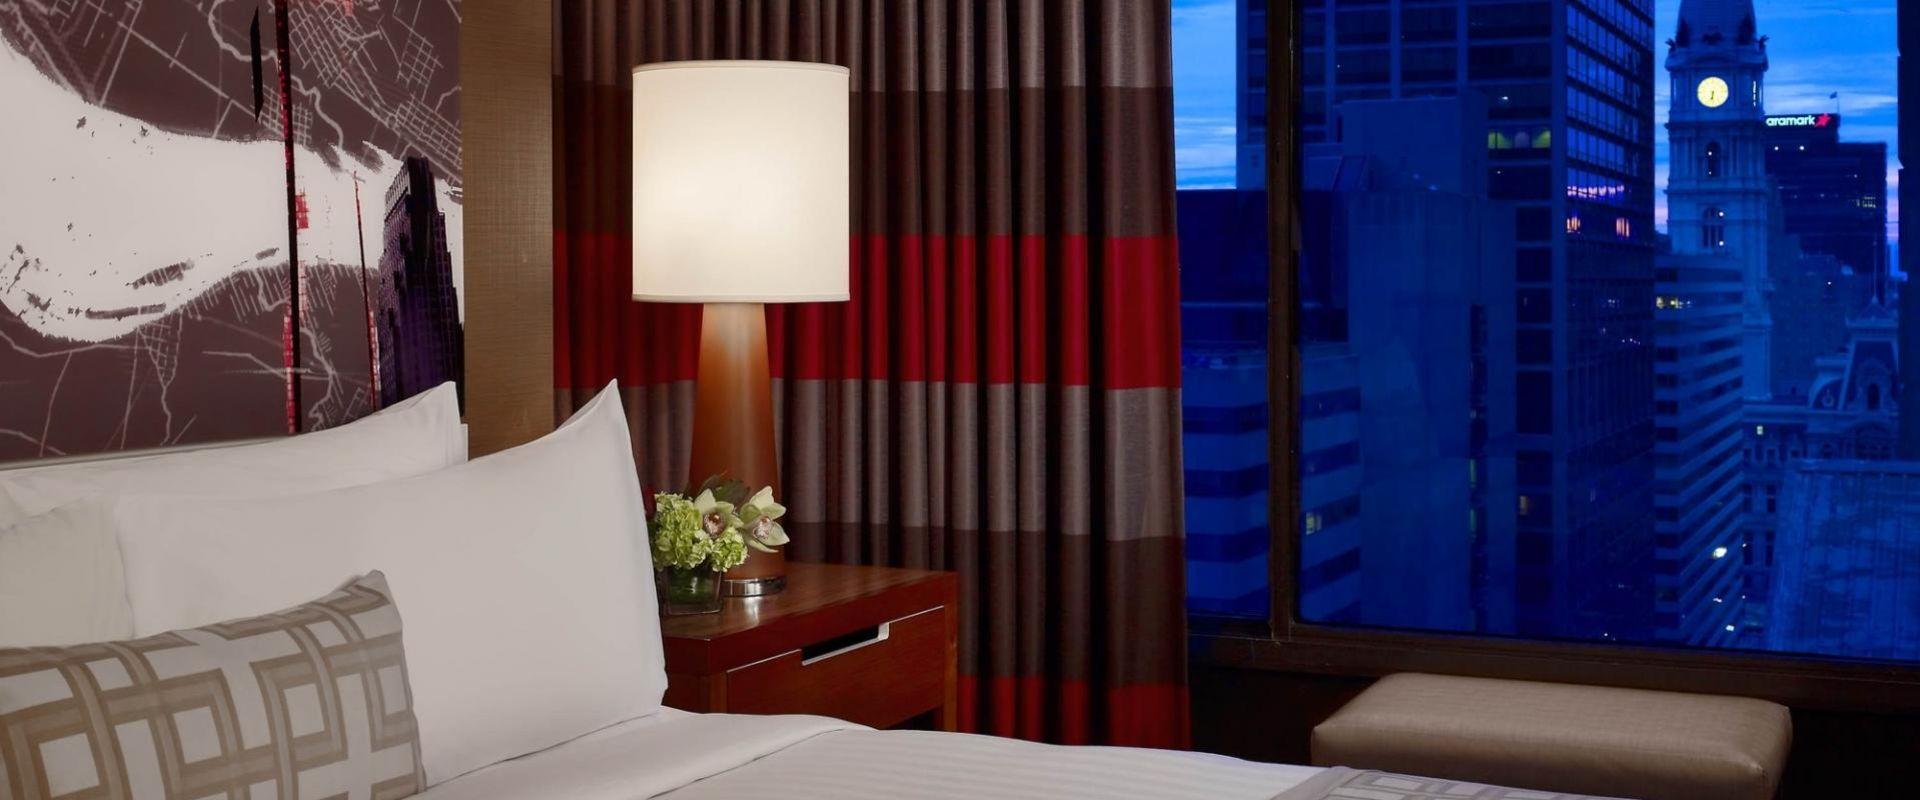 Sonesta Philadelphia Downtown Club Level Guest Rooms